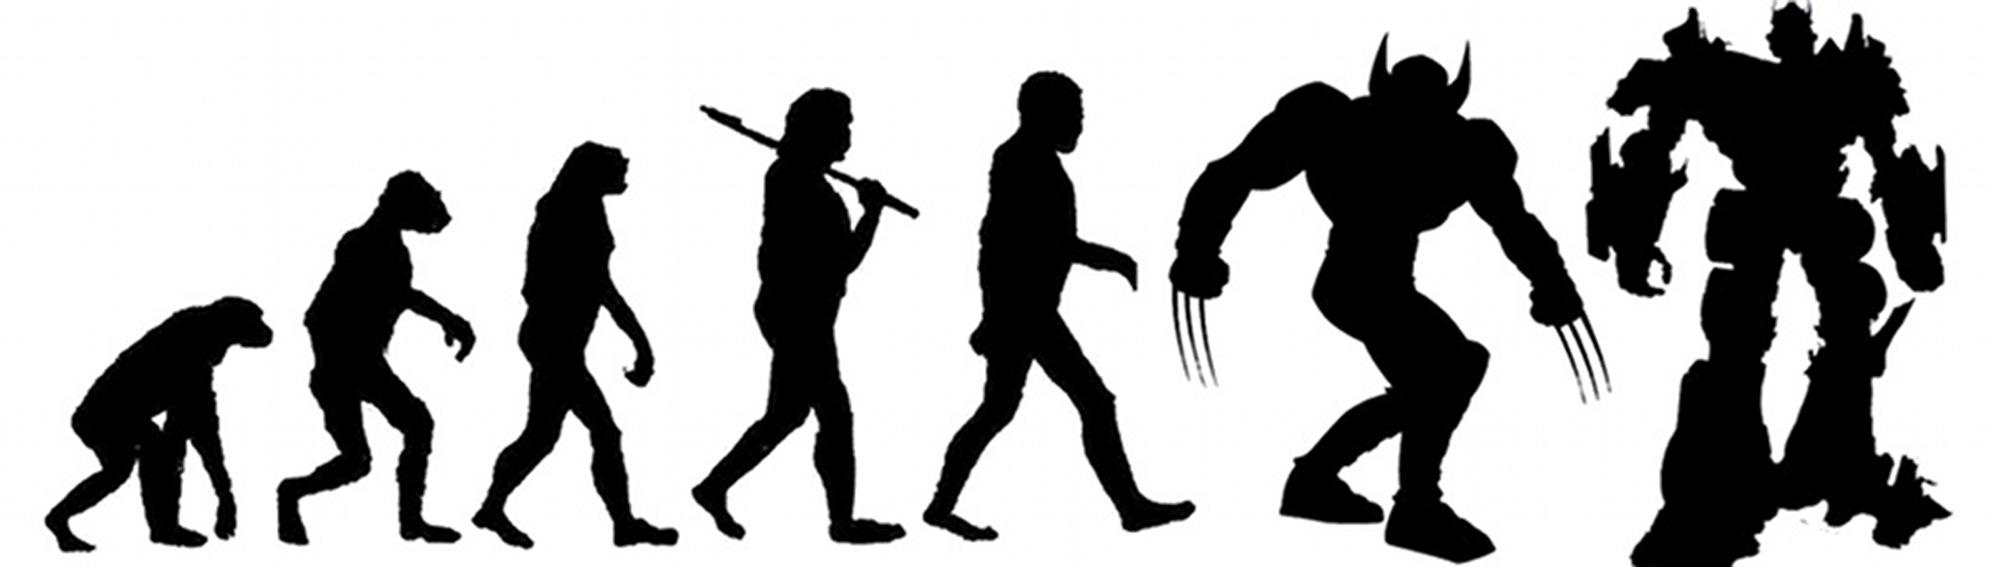 Future-of-Evolution.jpg